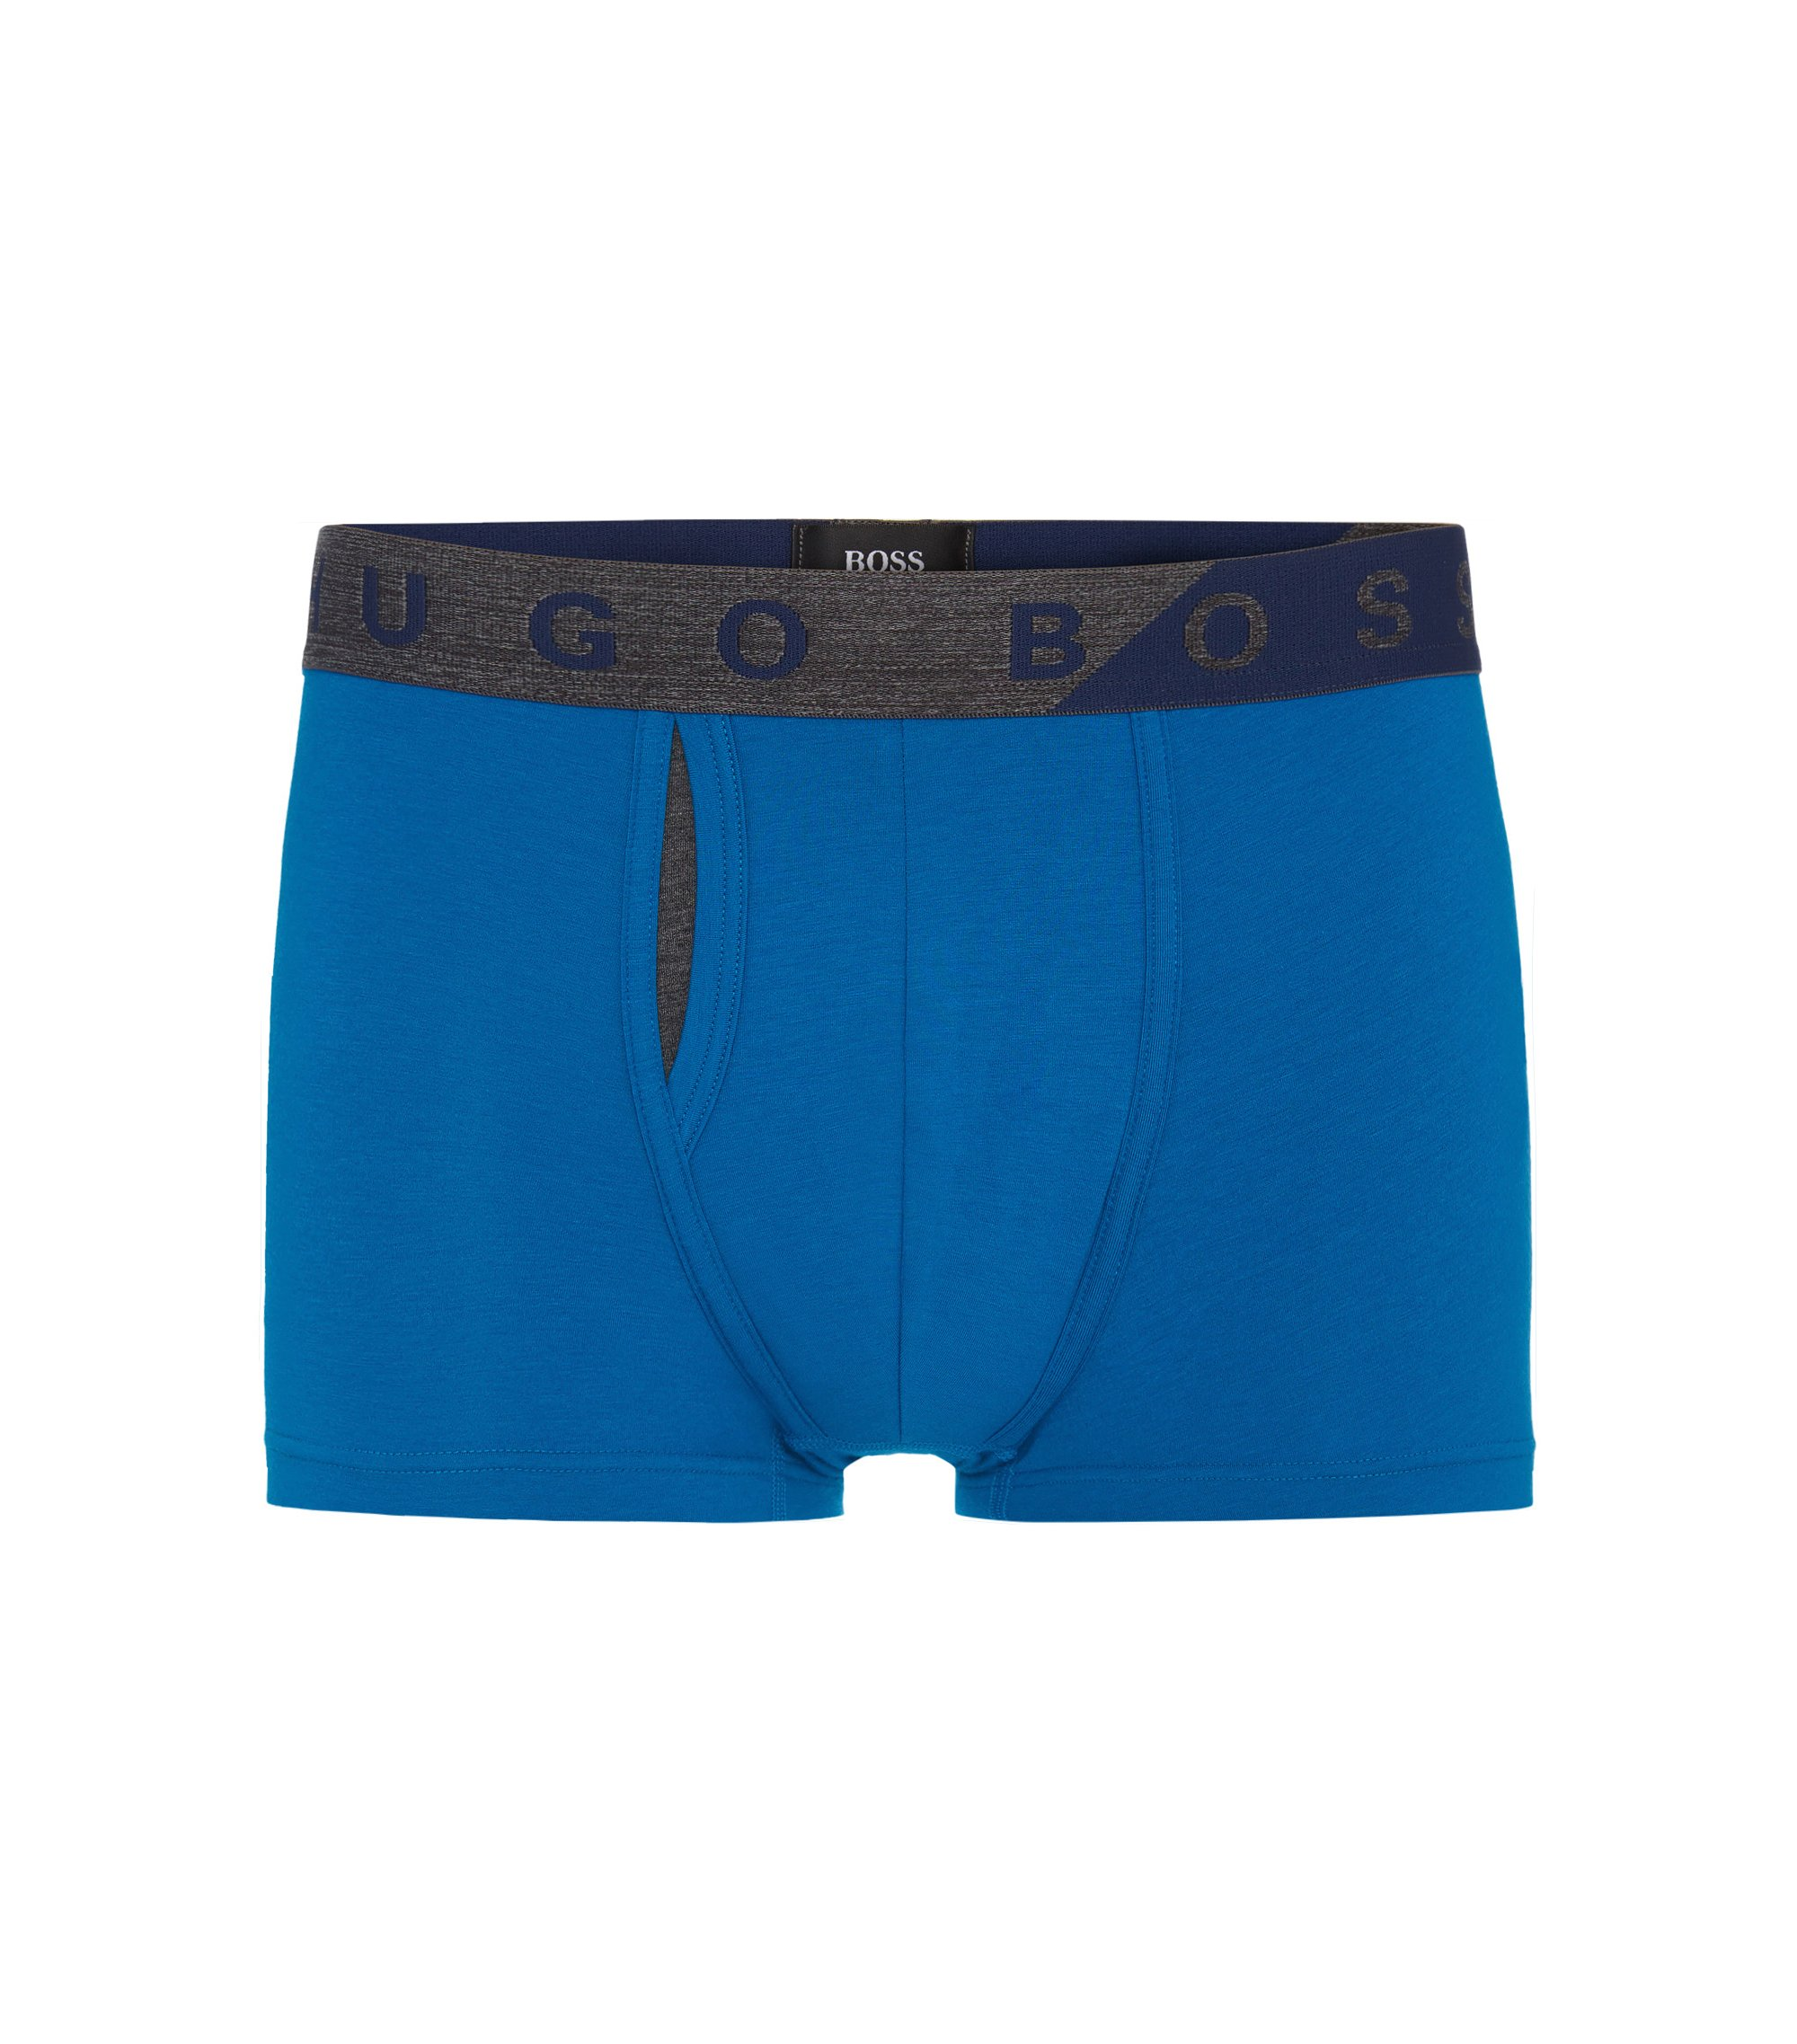 Stretch Cotton Modal Trunk | Trunk Comfort, Blue